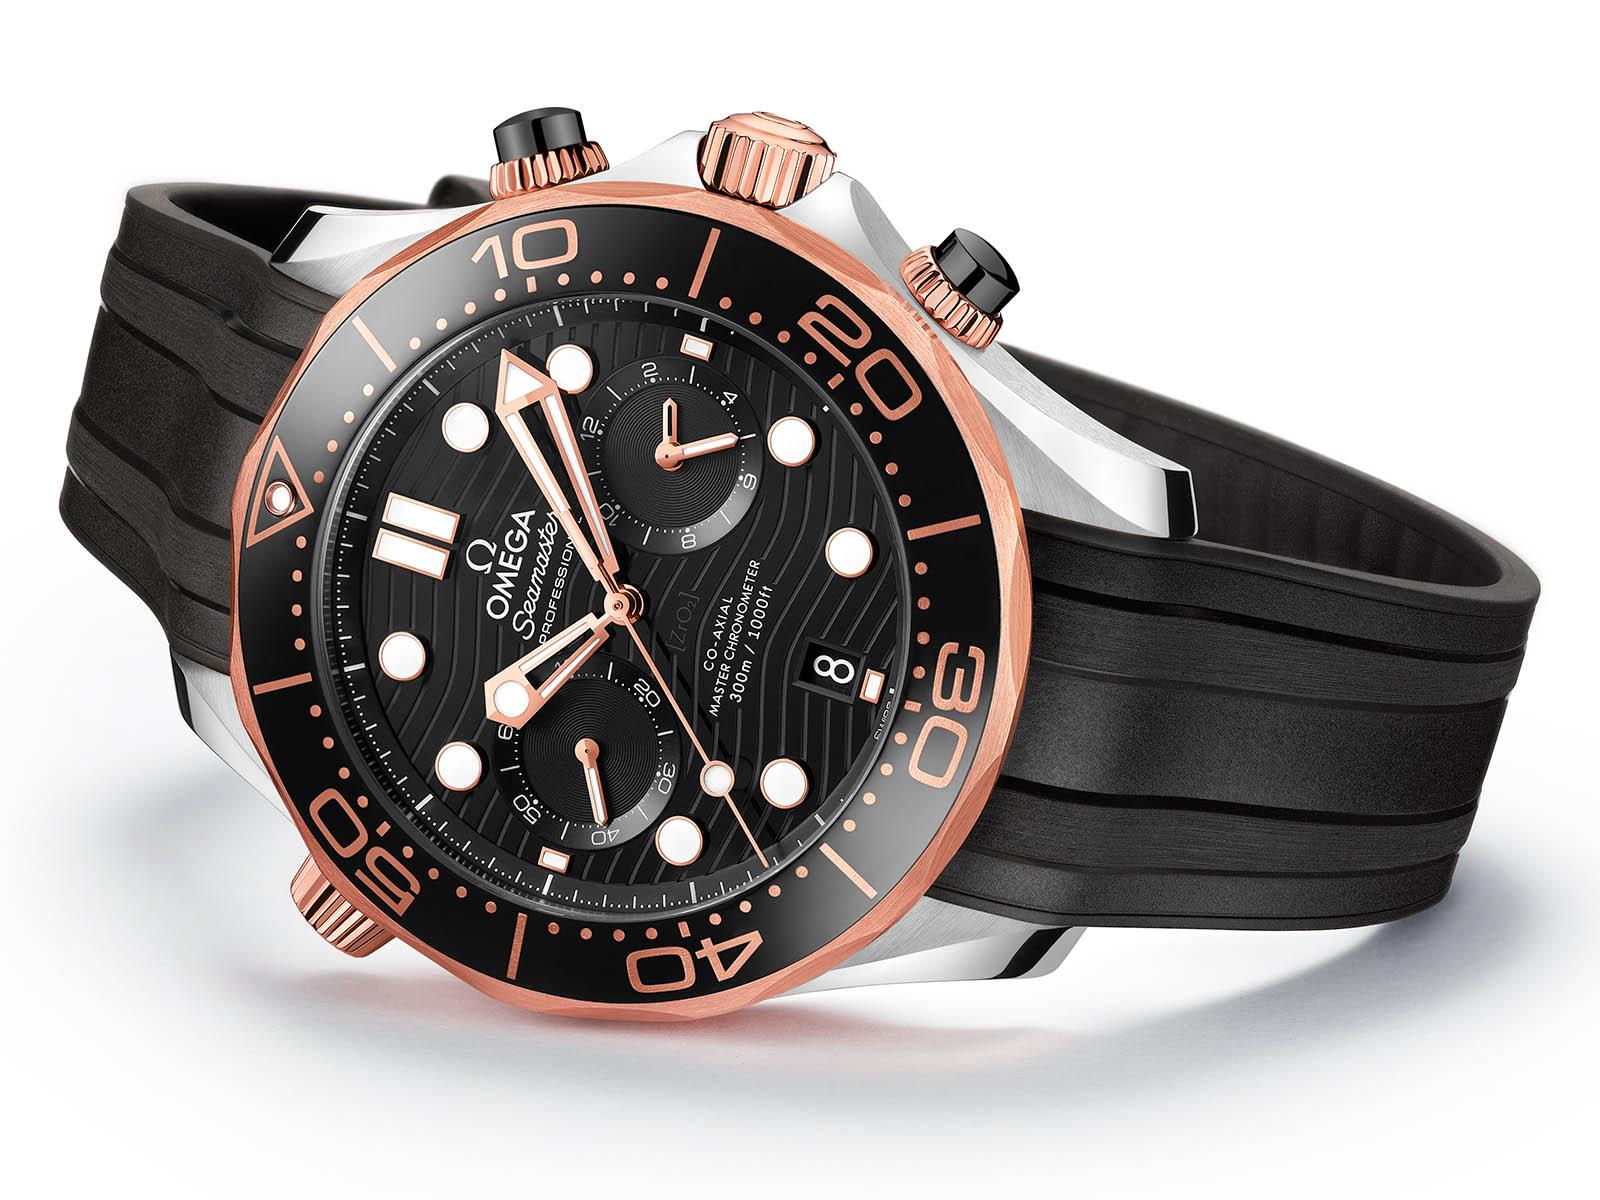 210-22-44-51-01-001-omega-seamaster-diver-300m-chronograph-2.jpg